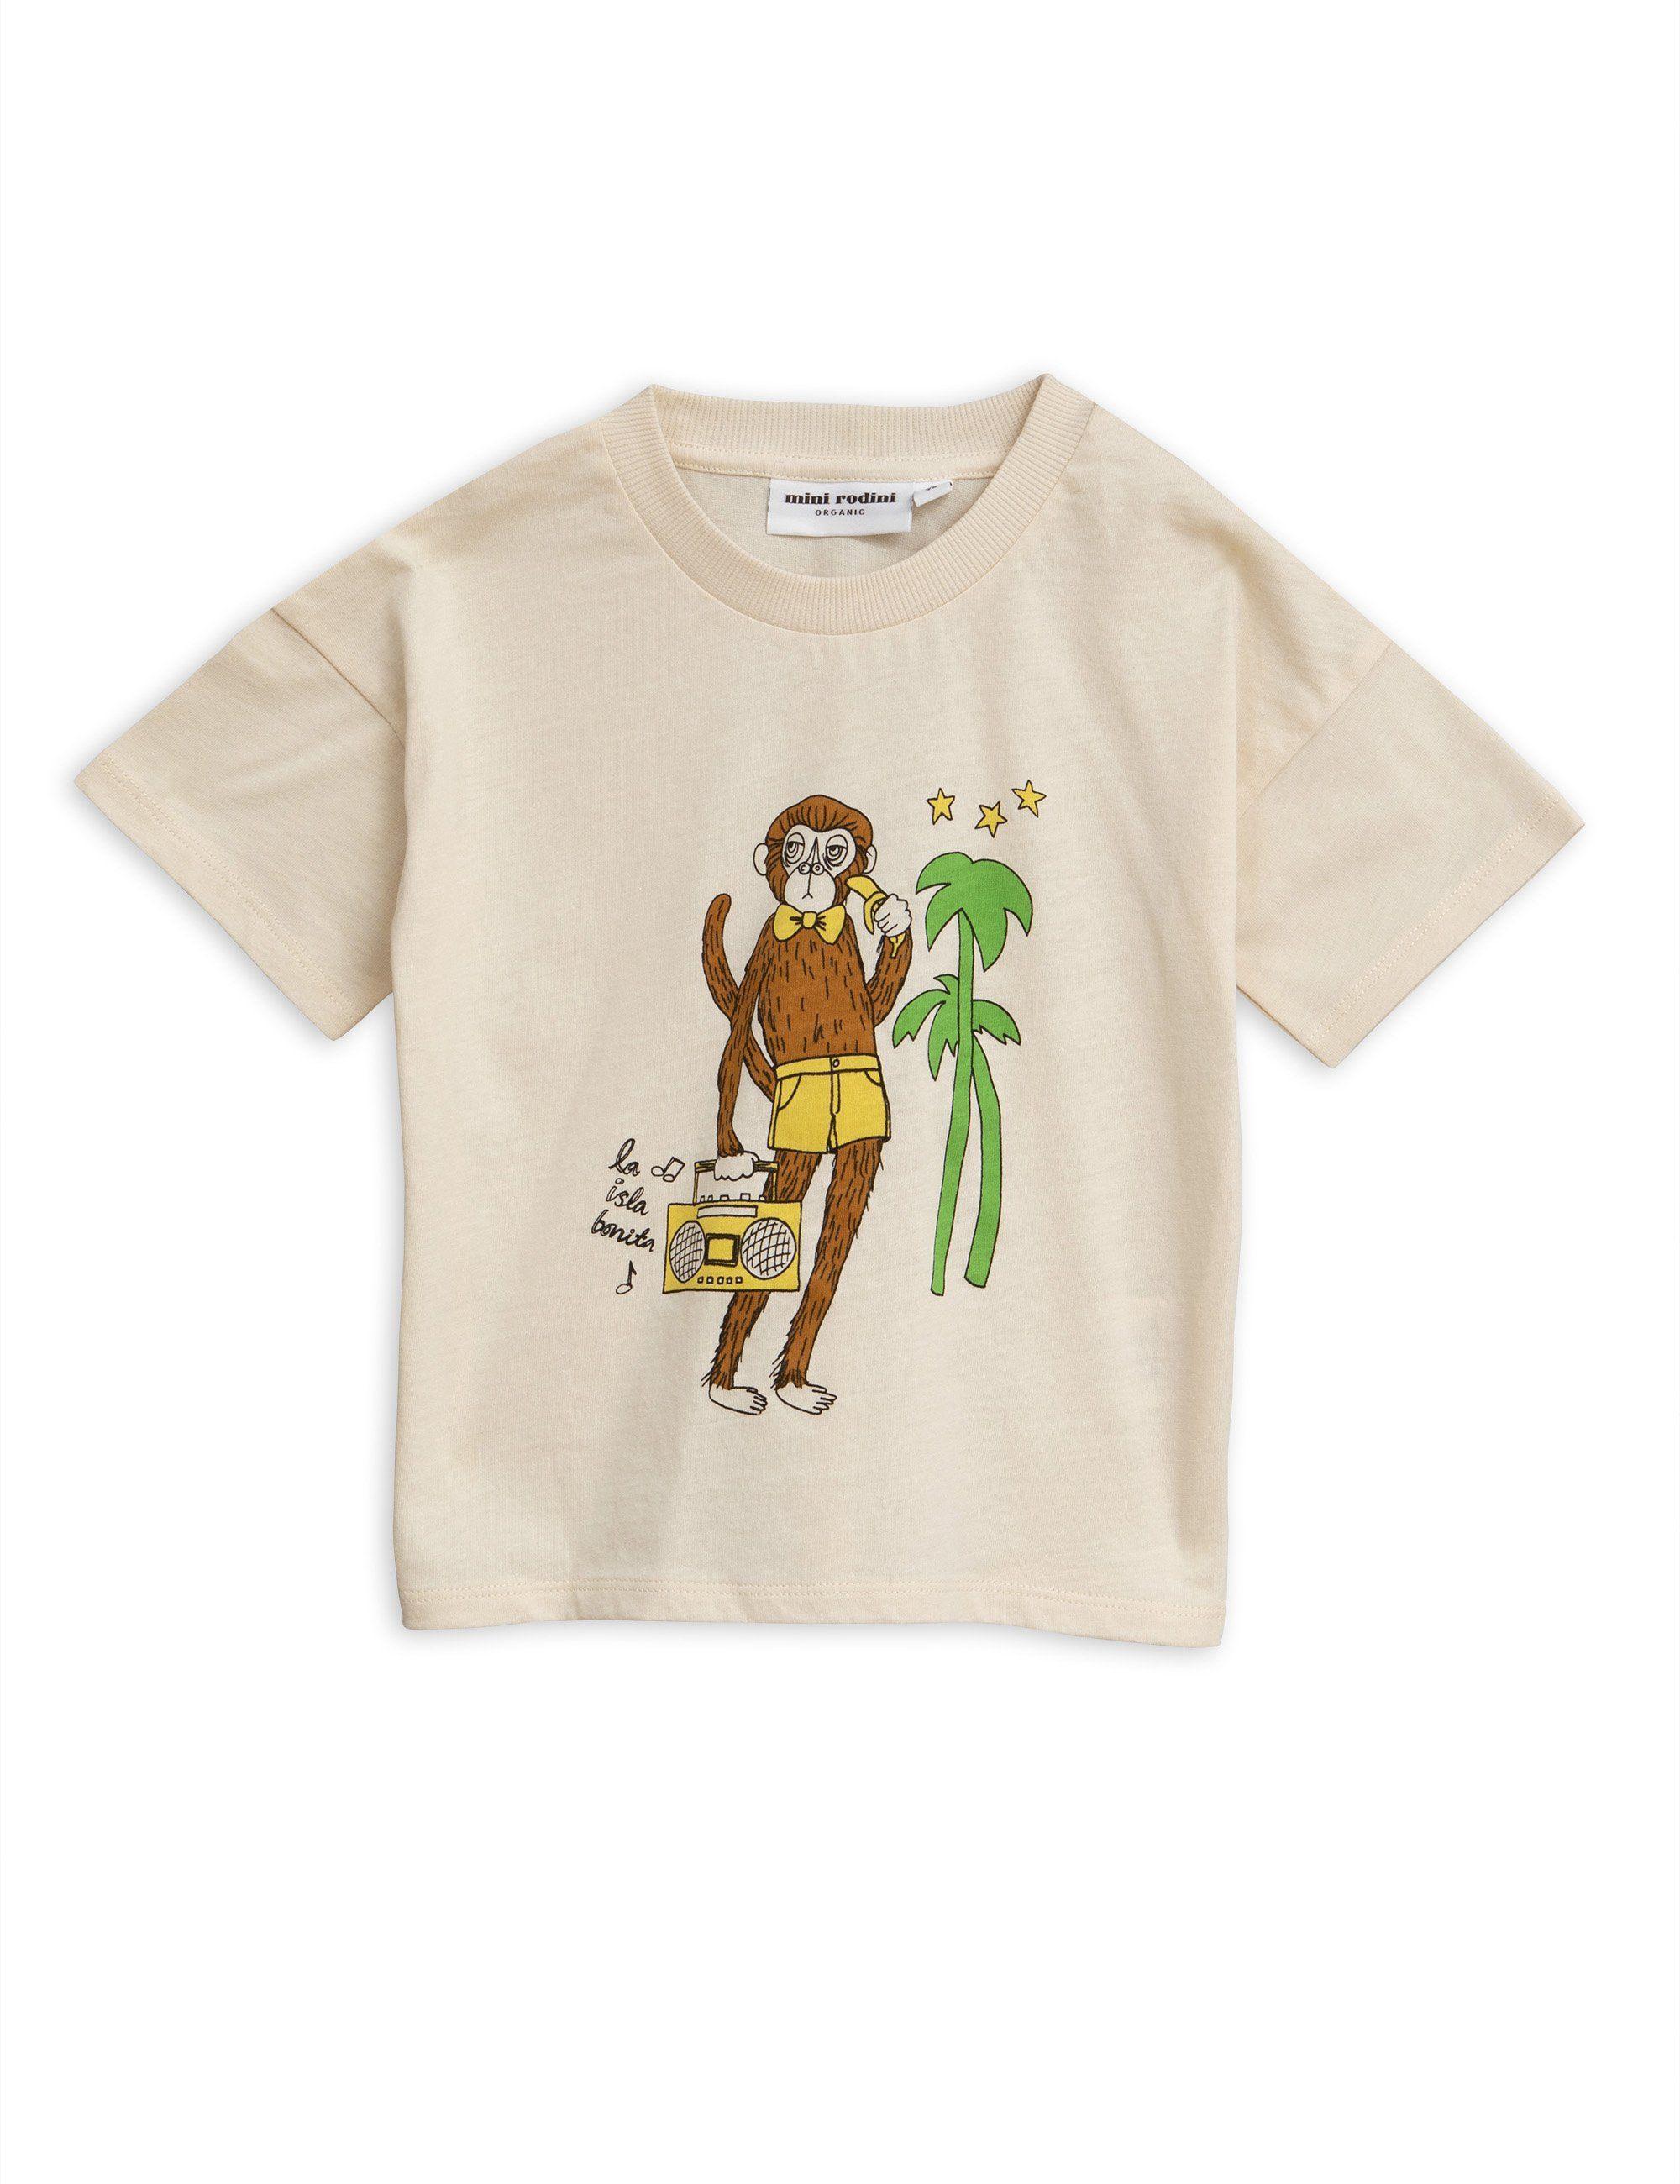 6a352e2c0 Mini Rodini Cool Monkey Sp Tee | Children's clothing | Monkey t ...